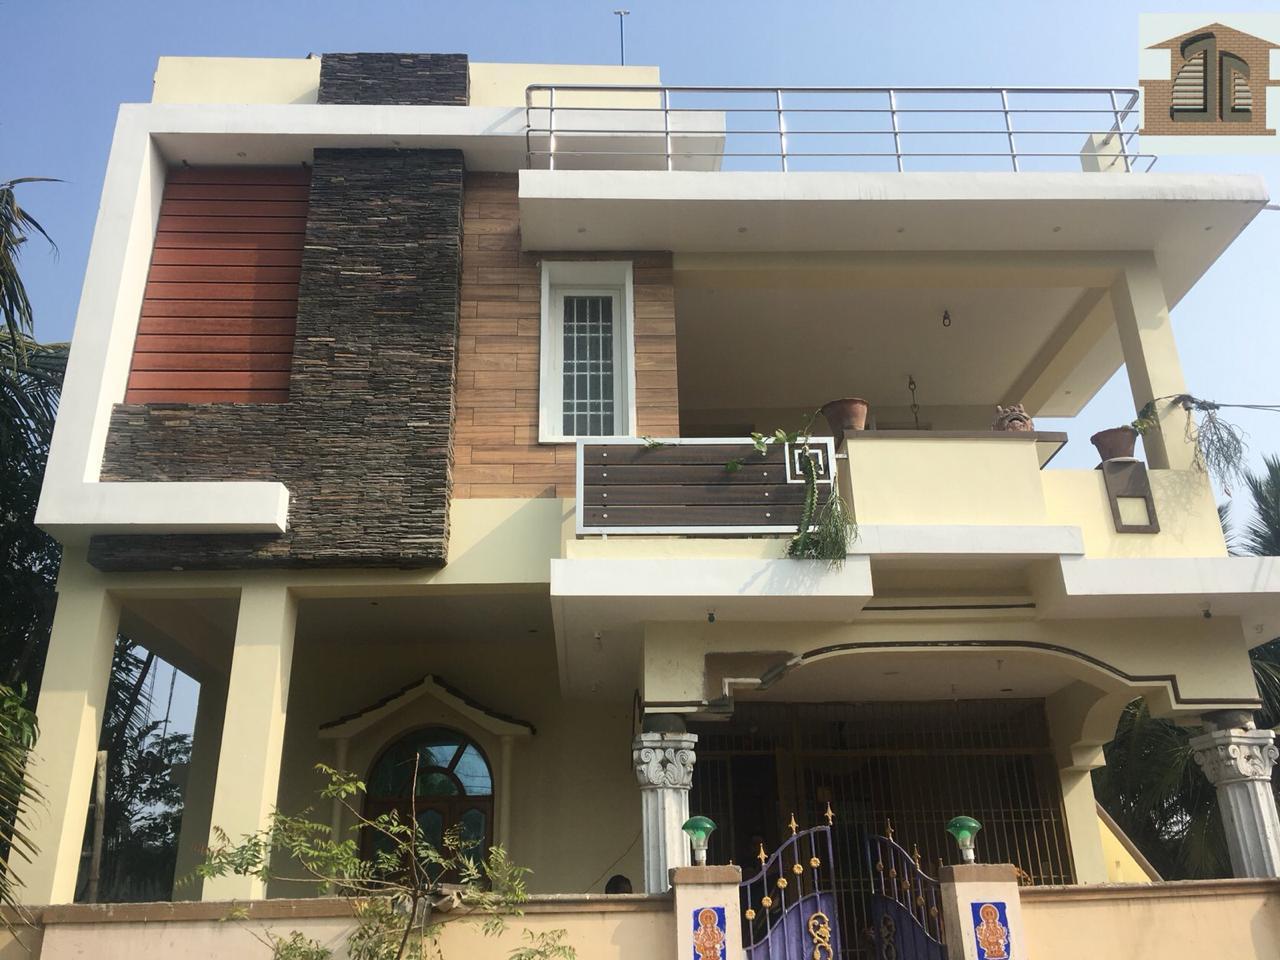 Top 100 Builders in Karaikal - Best Construction Companies - Justdial